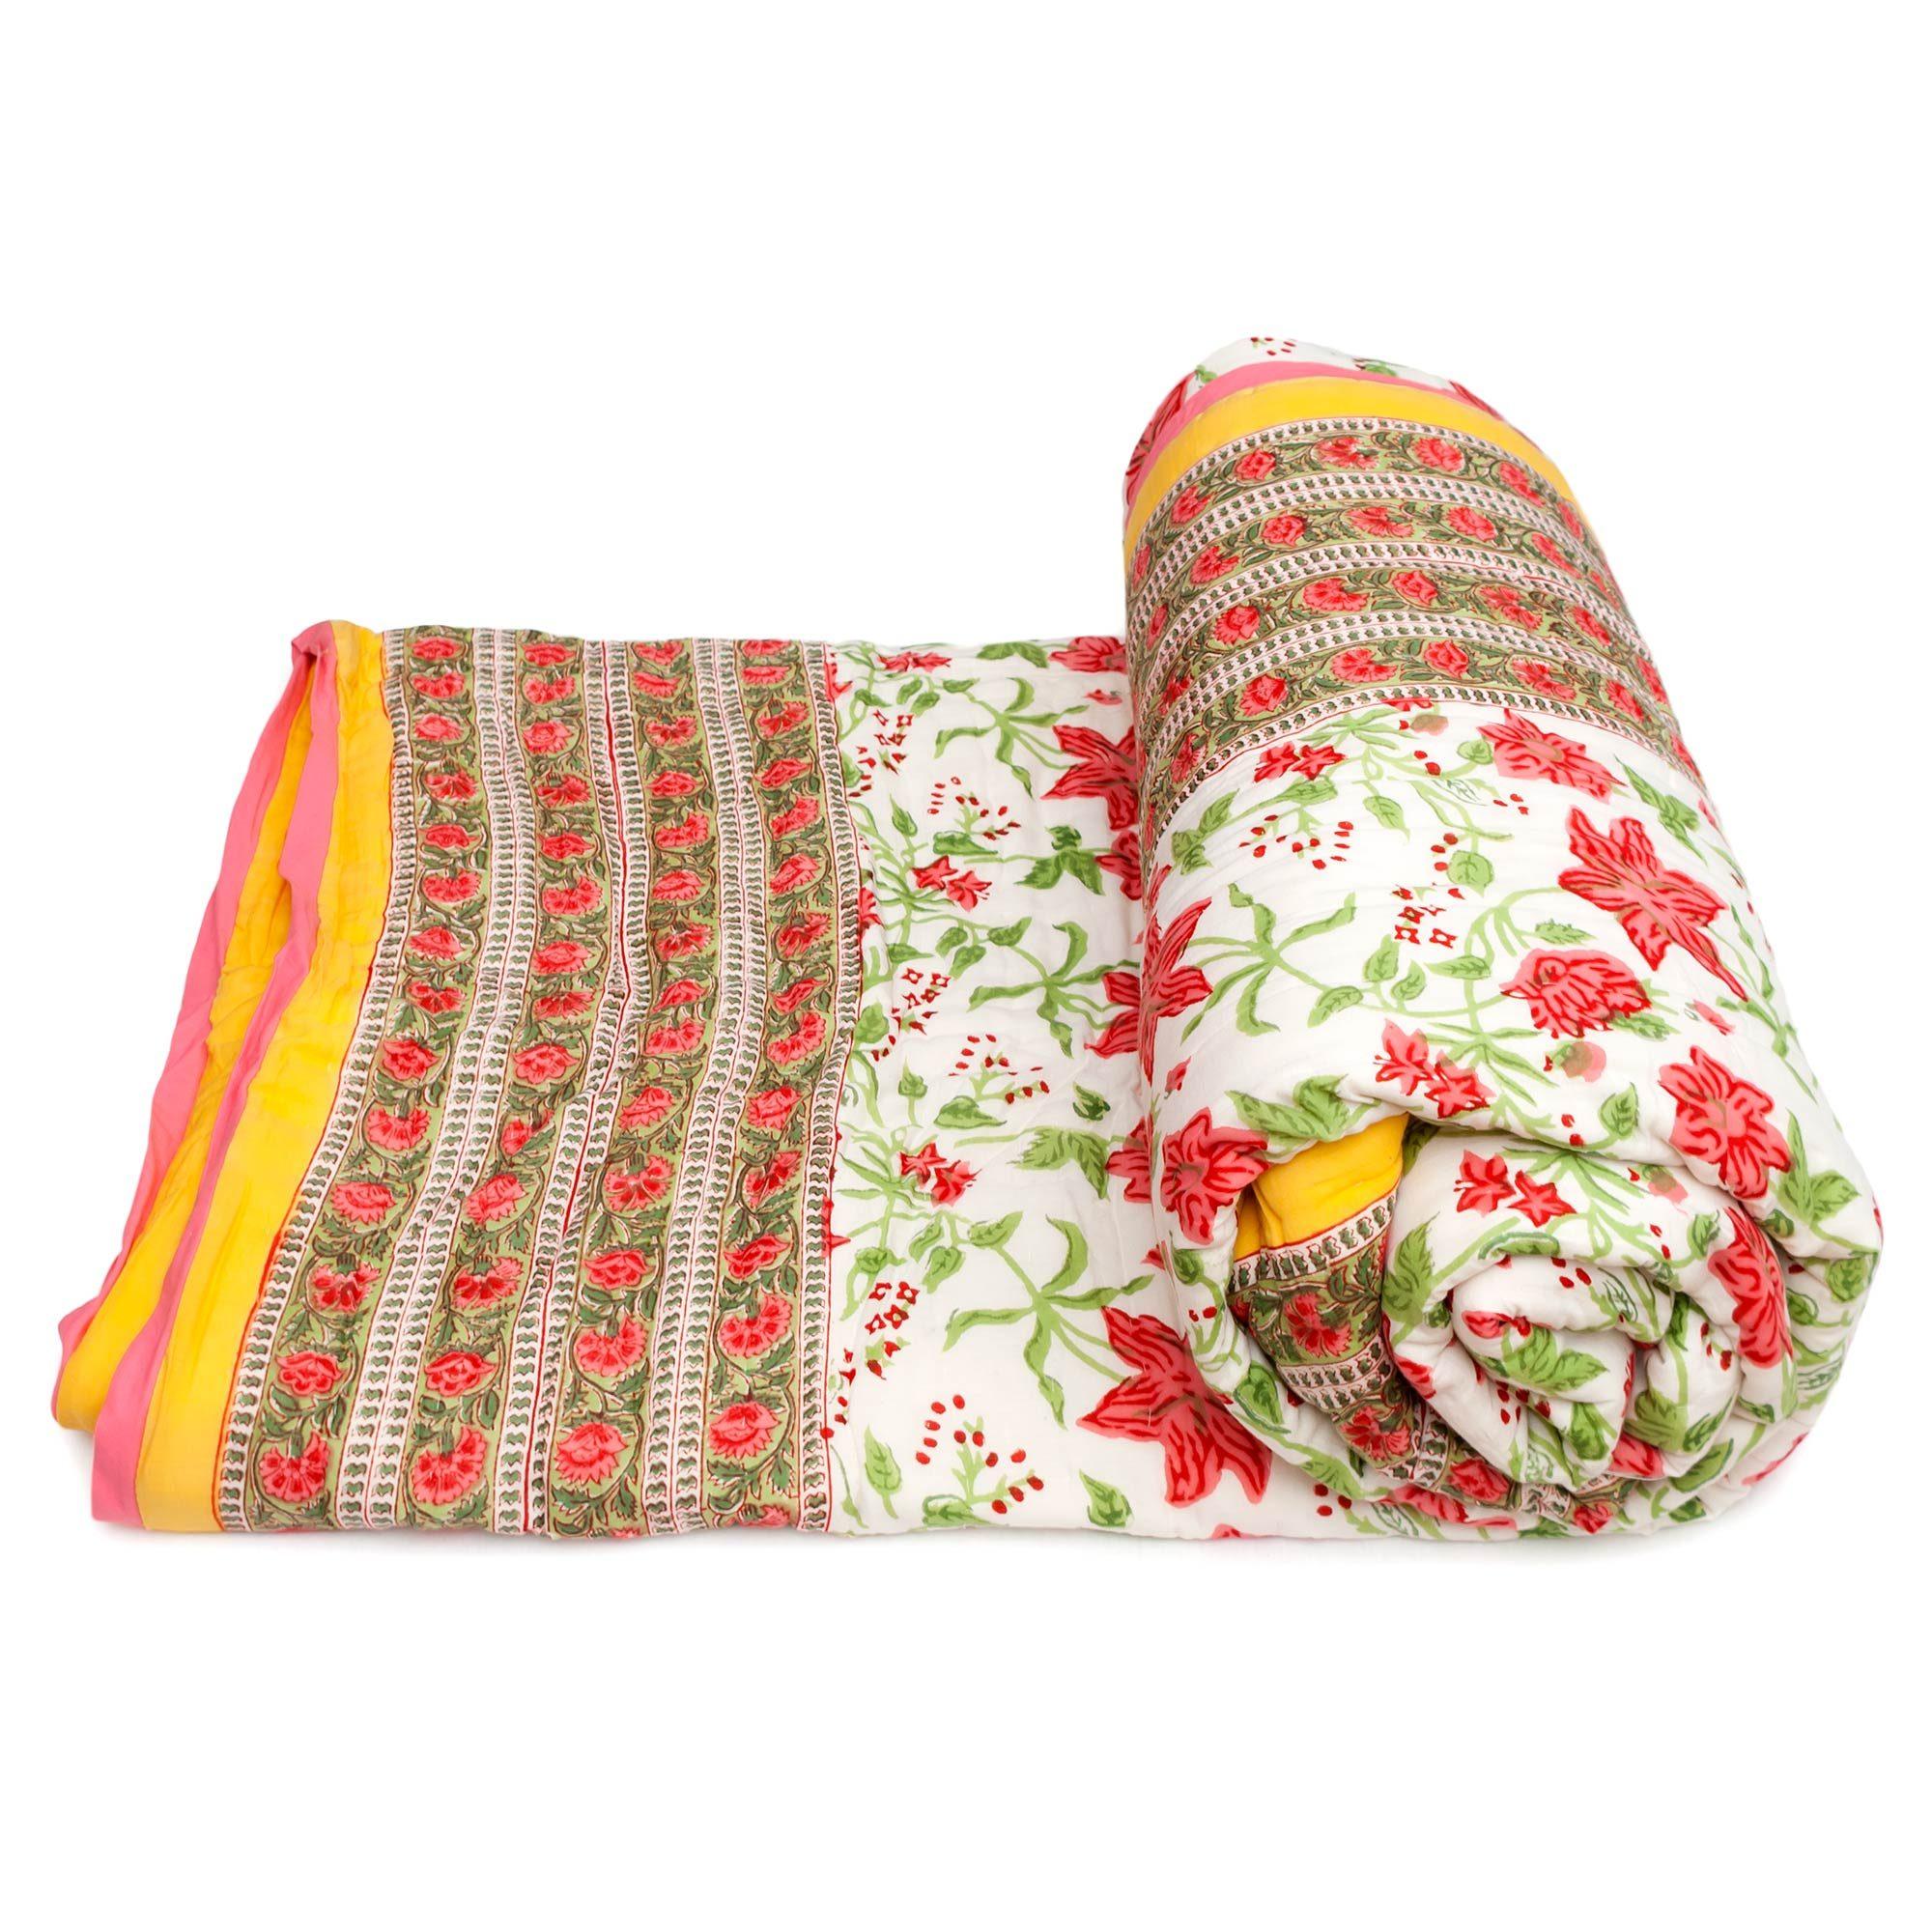 Tara-Textile - indische Decke - Kuscheldecke Jyoti